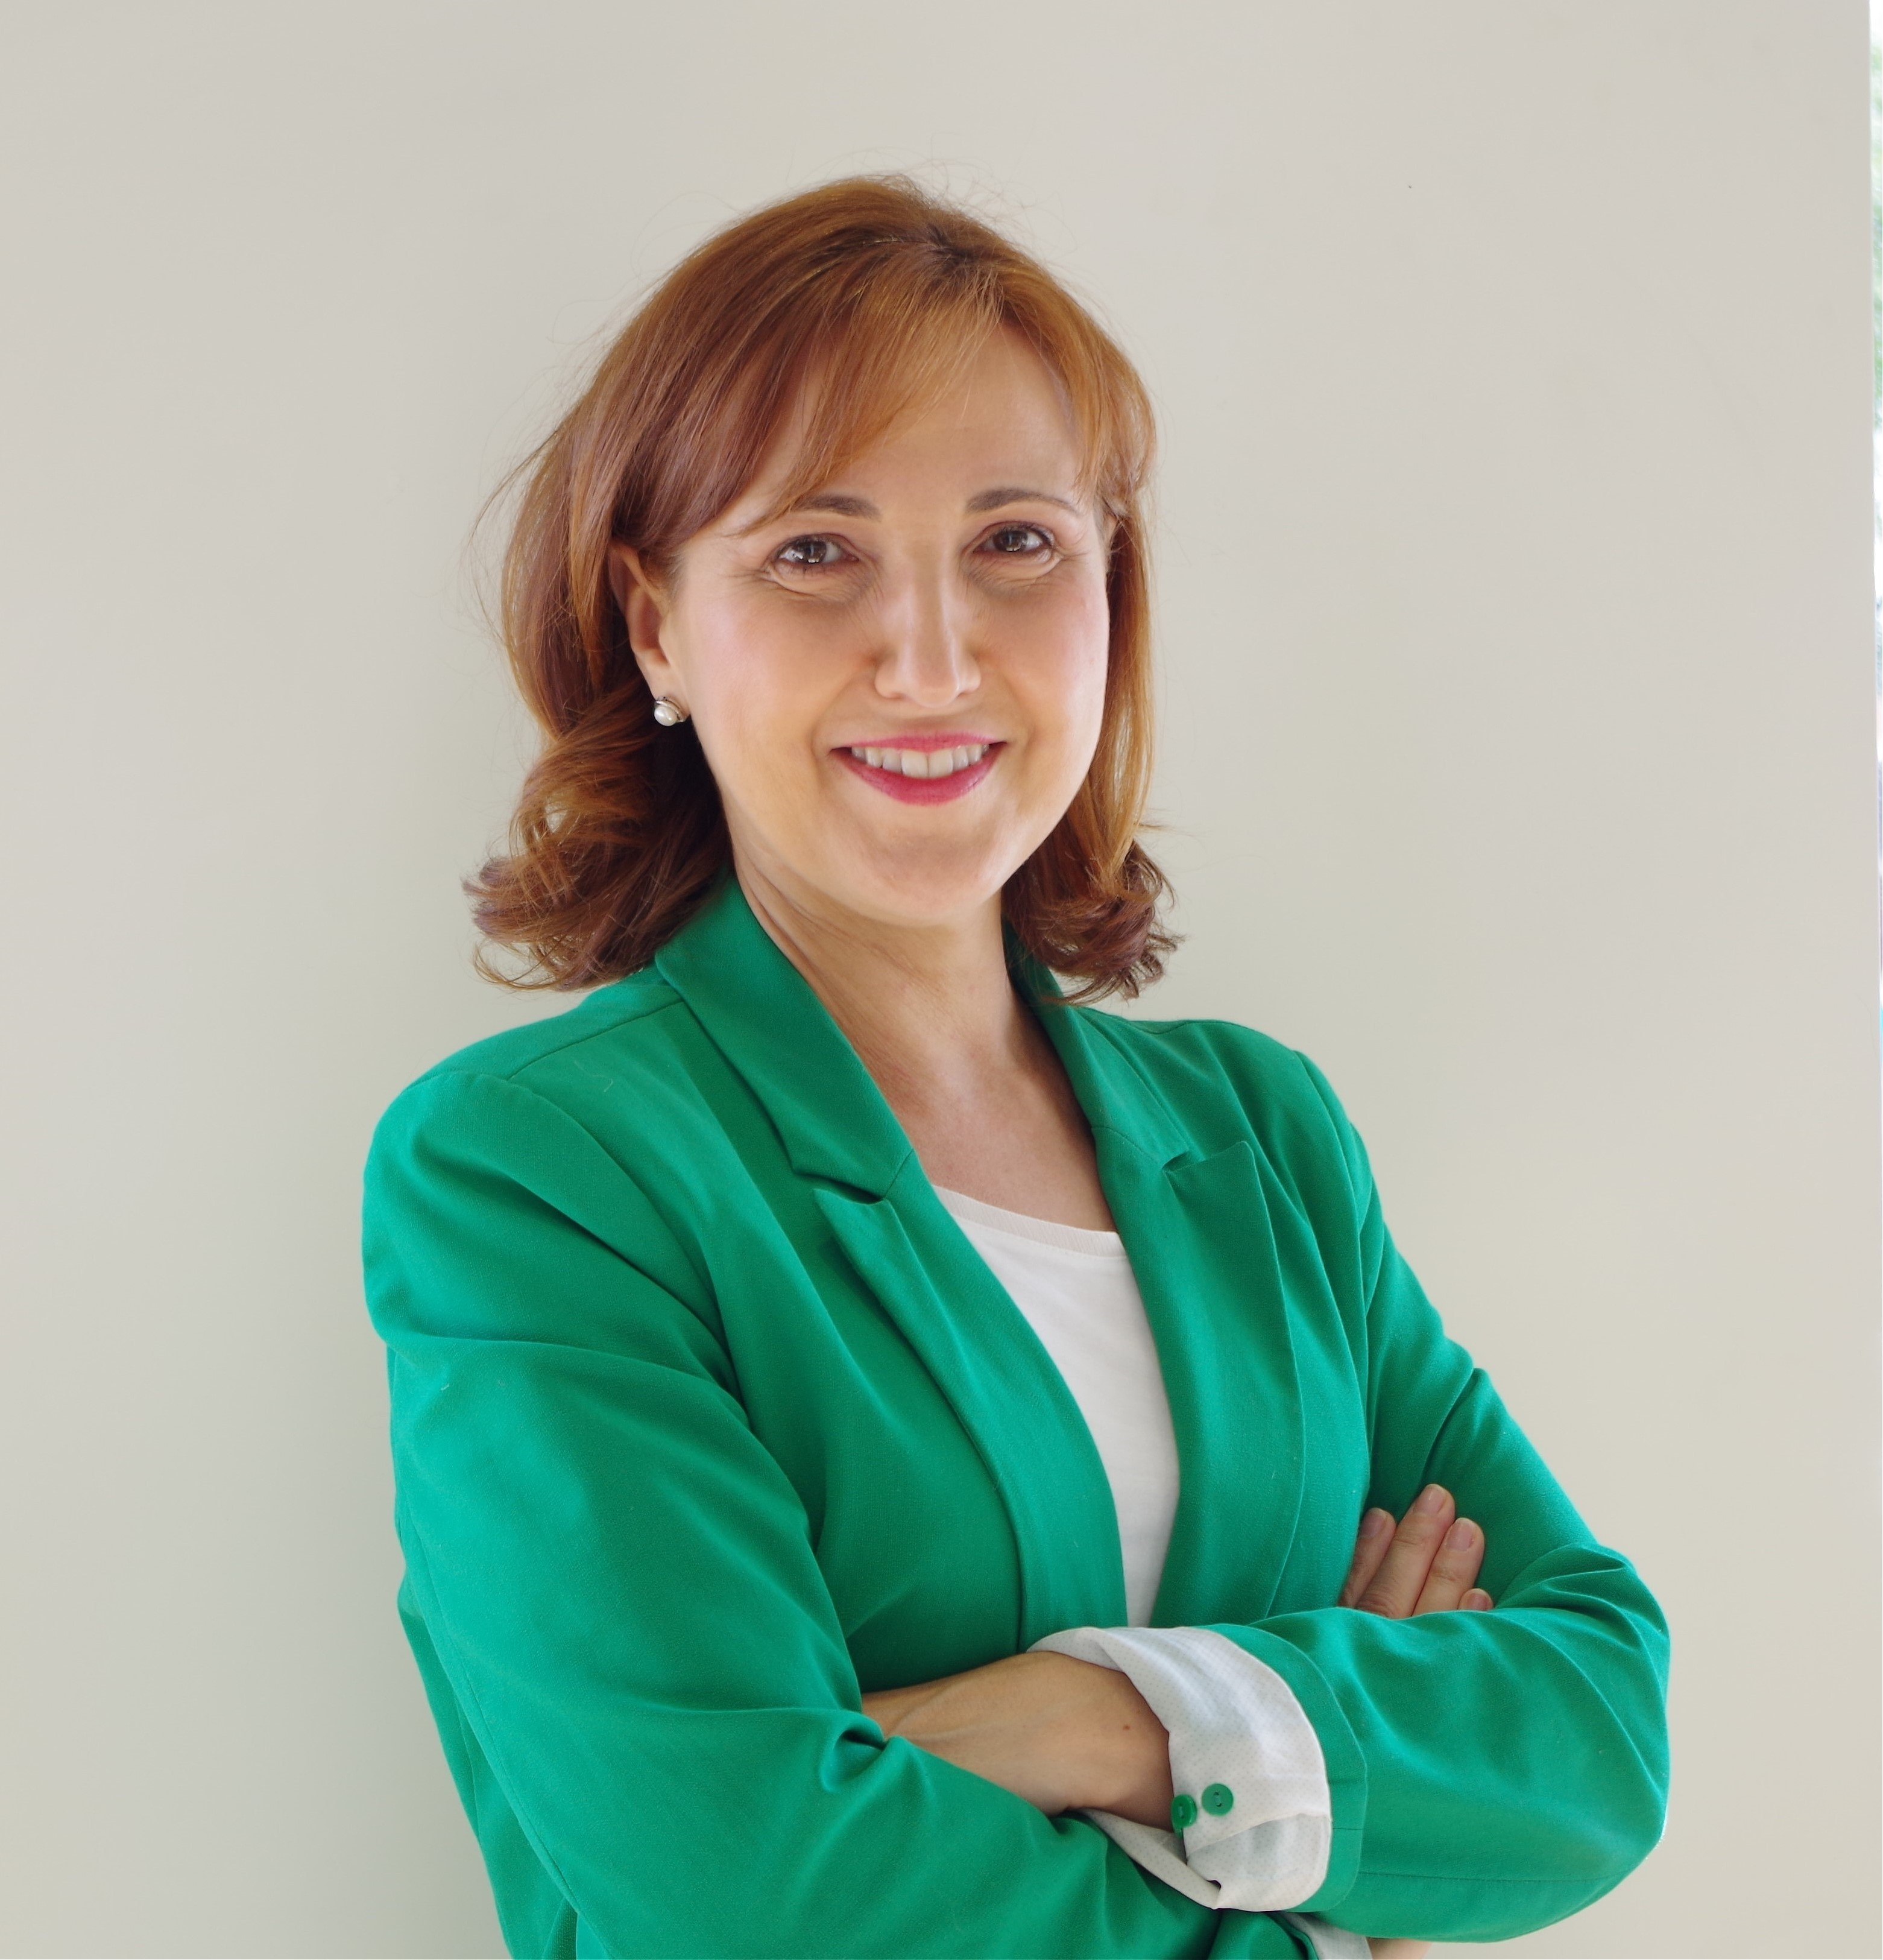 Susana Huerga